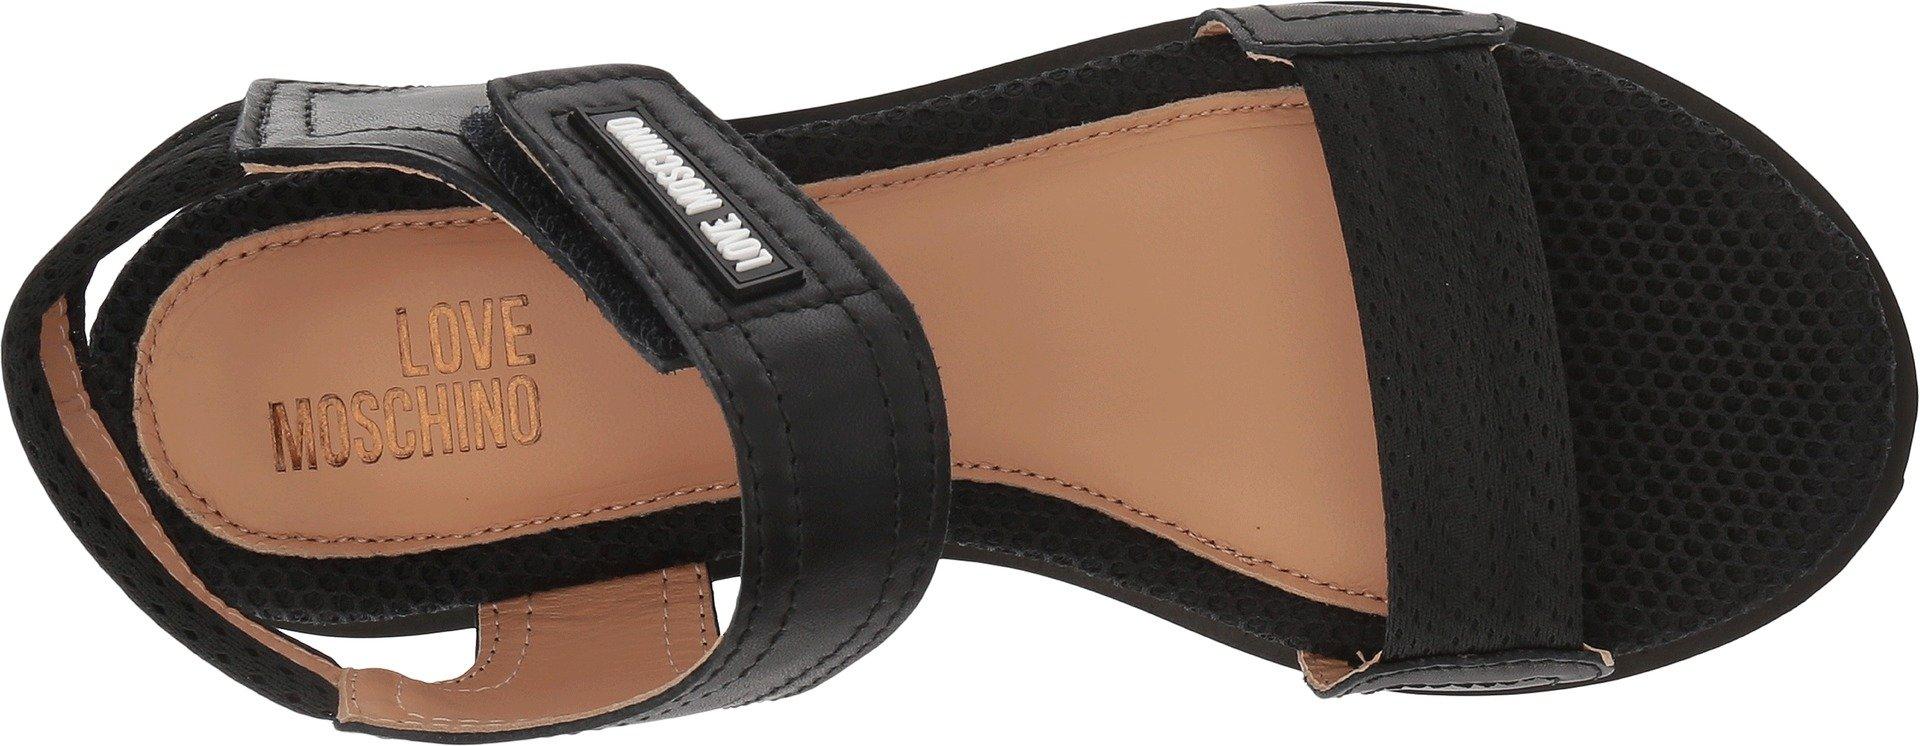 Love Moschino Women's Mesh Sandal Black 35 M EU by Love Moschino (Image #2)